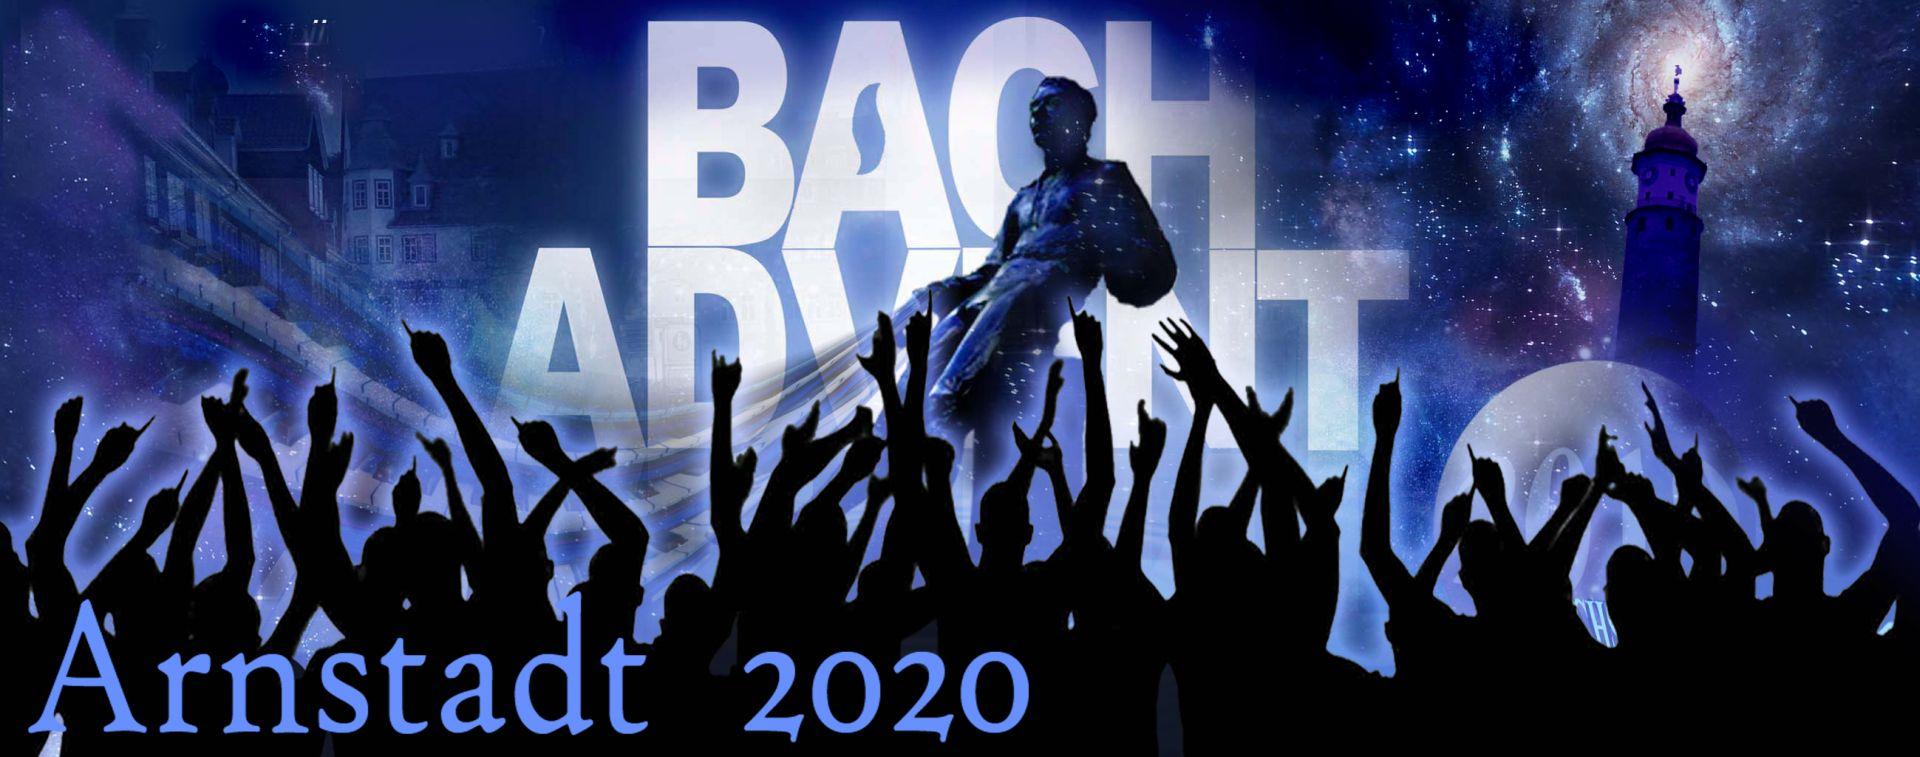 Bach-Advent 2020 ist abgesagt!